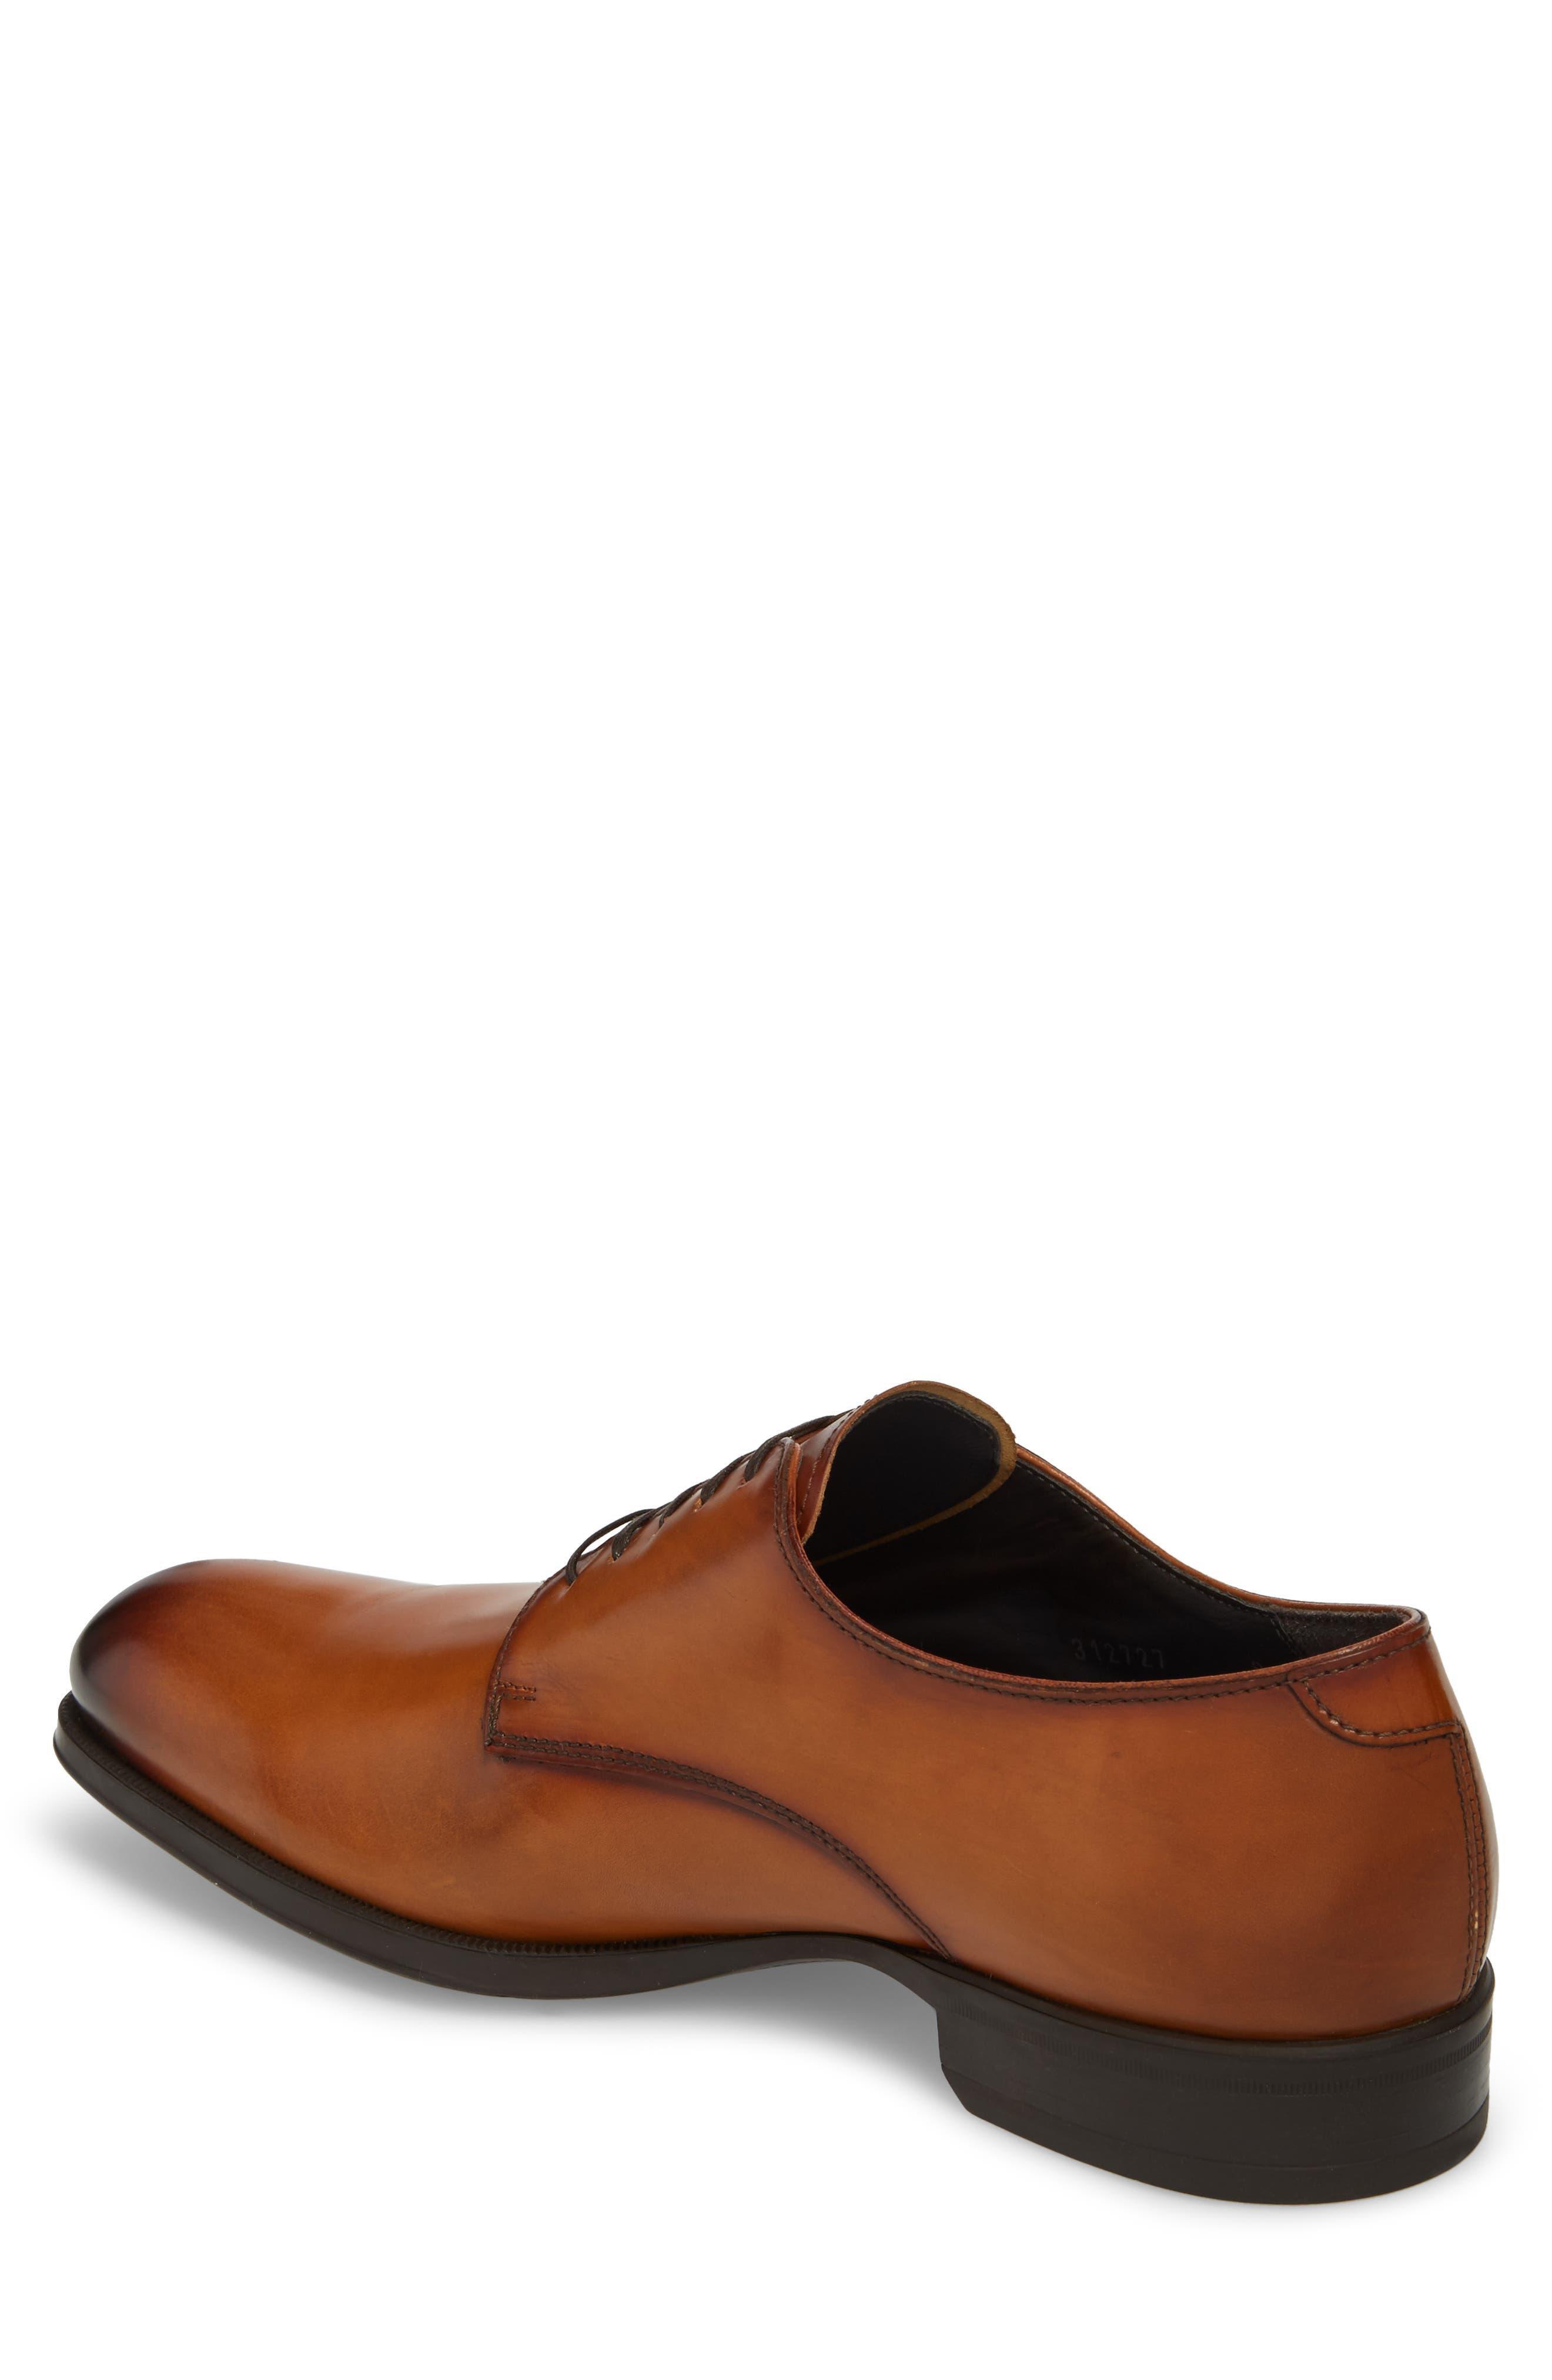 'Buchanan' Plain Toe Derby,                             Alternate thumbnail 2, color,                             245